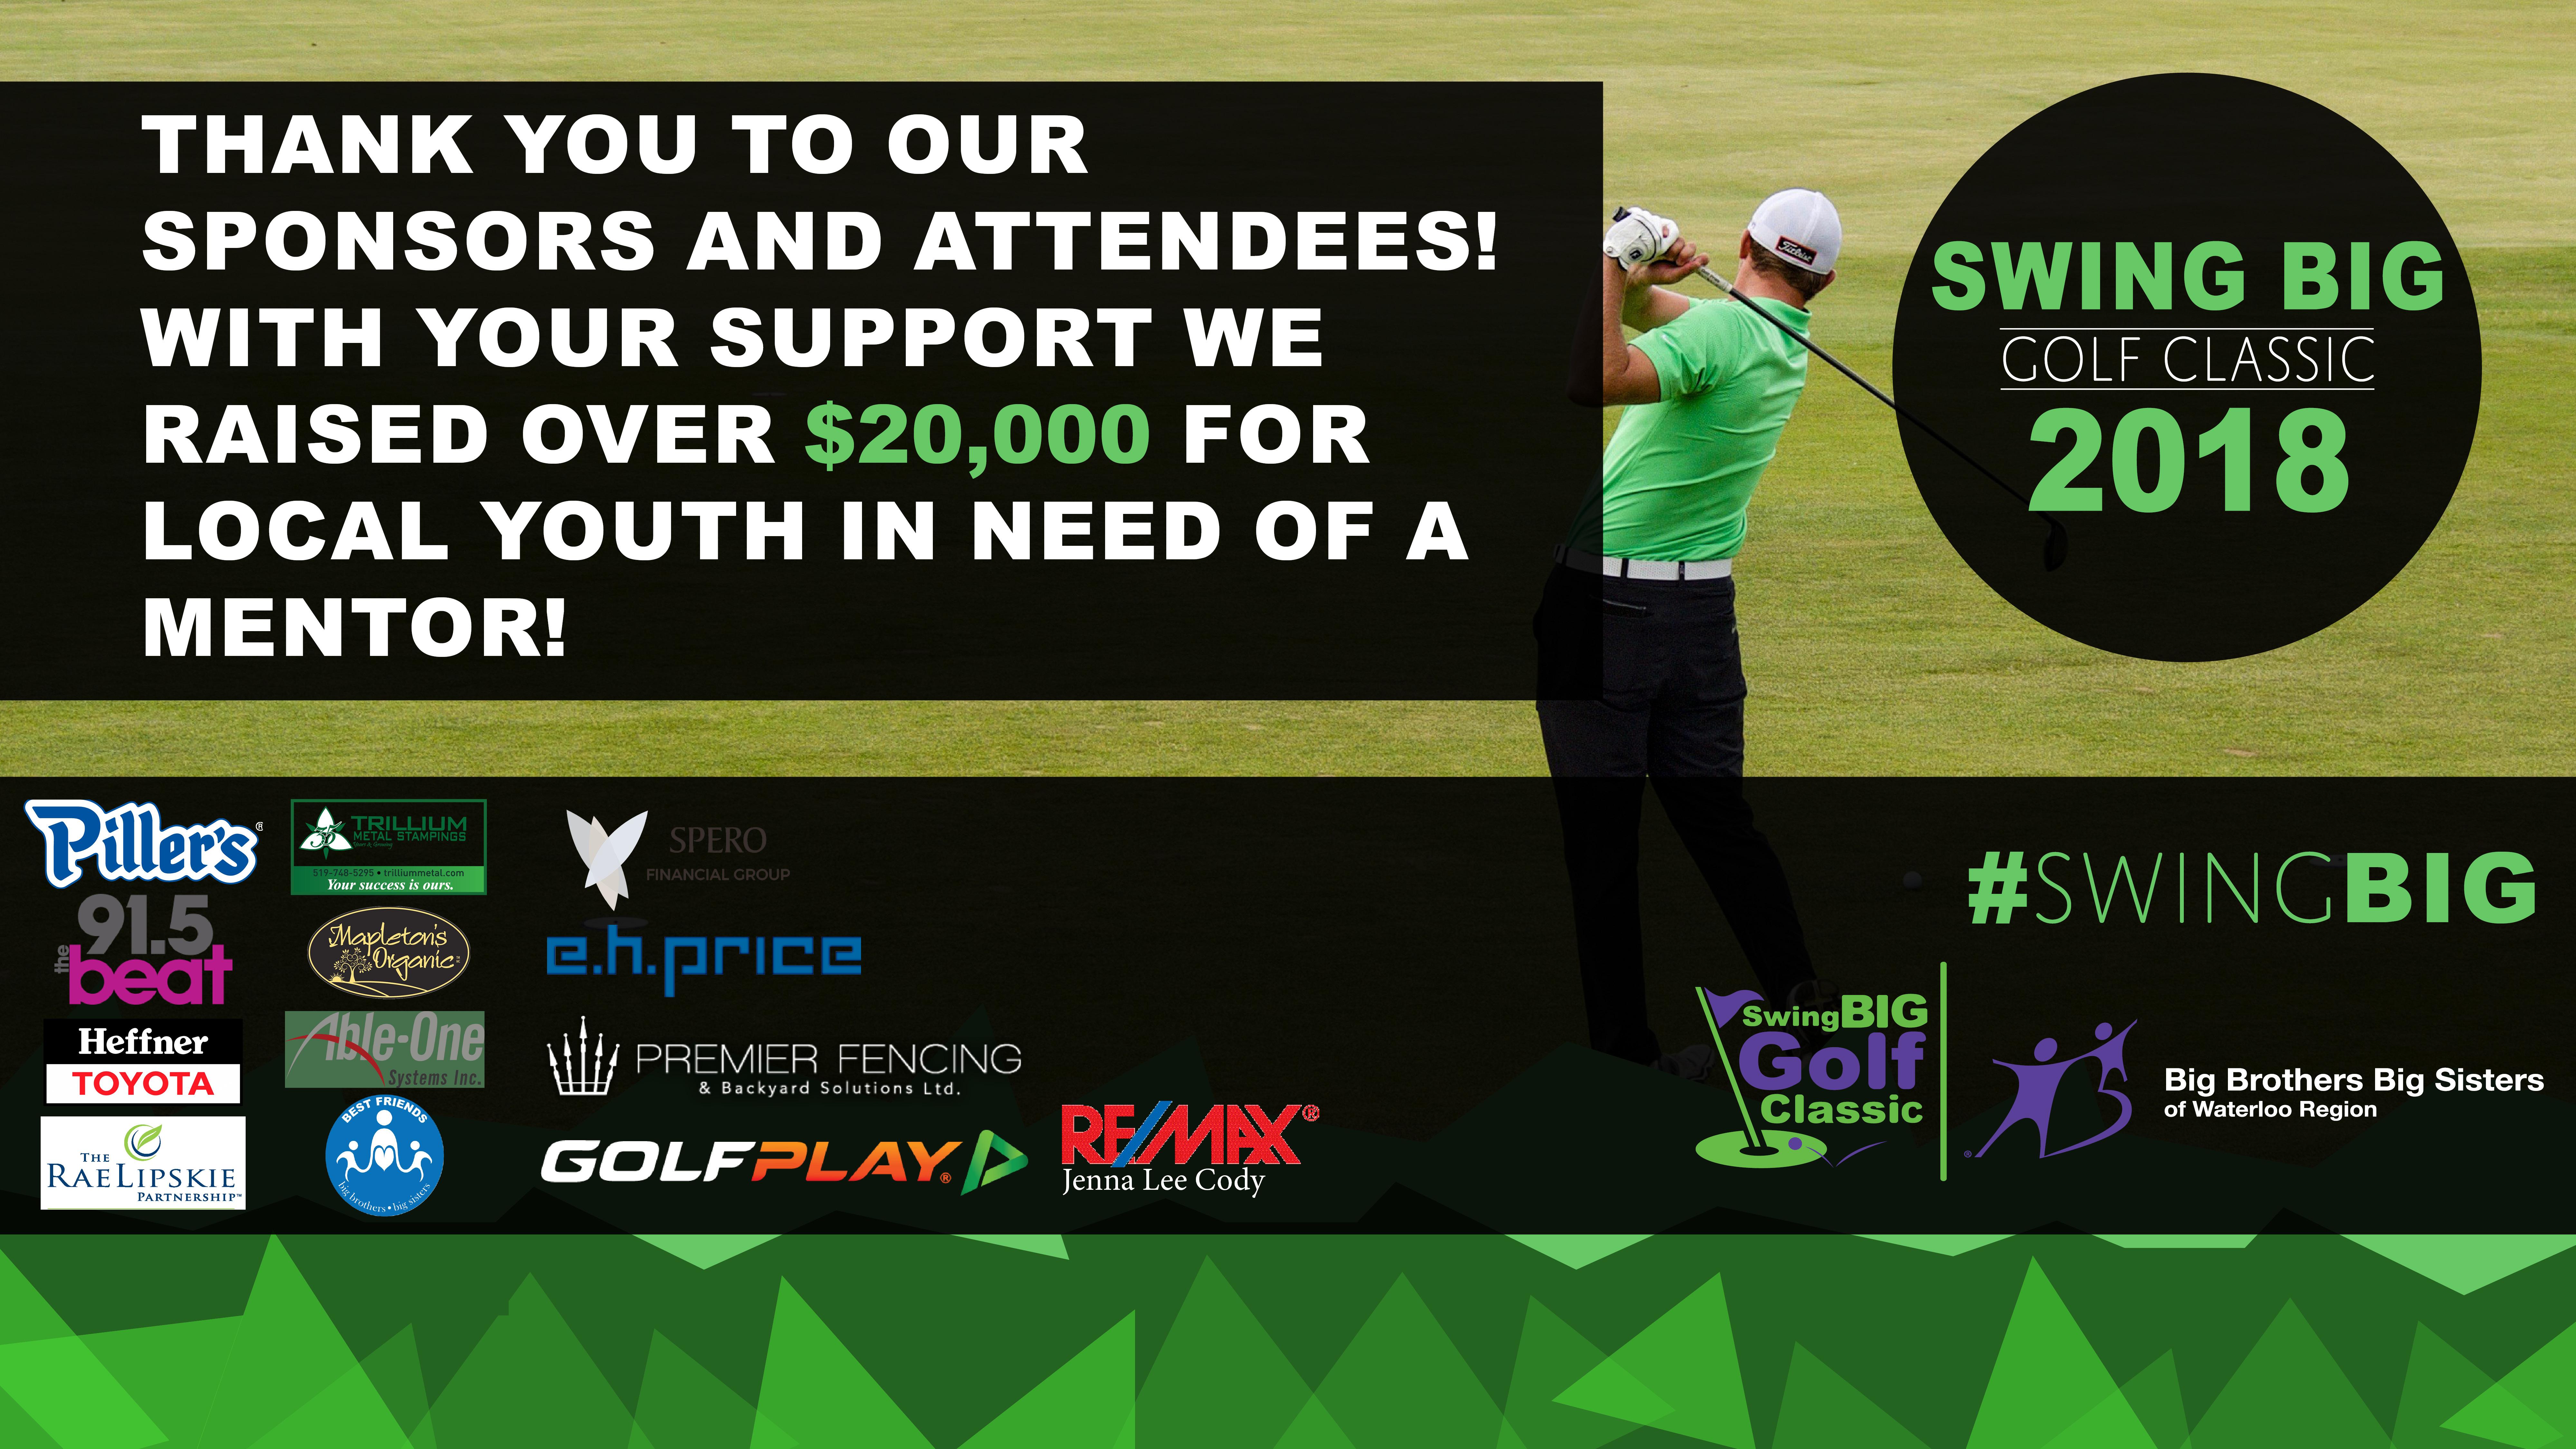 Swing Big Golf Classic Thank You Banner